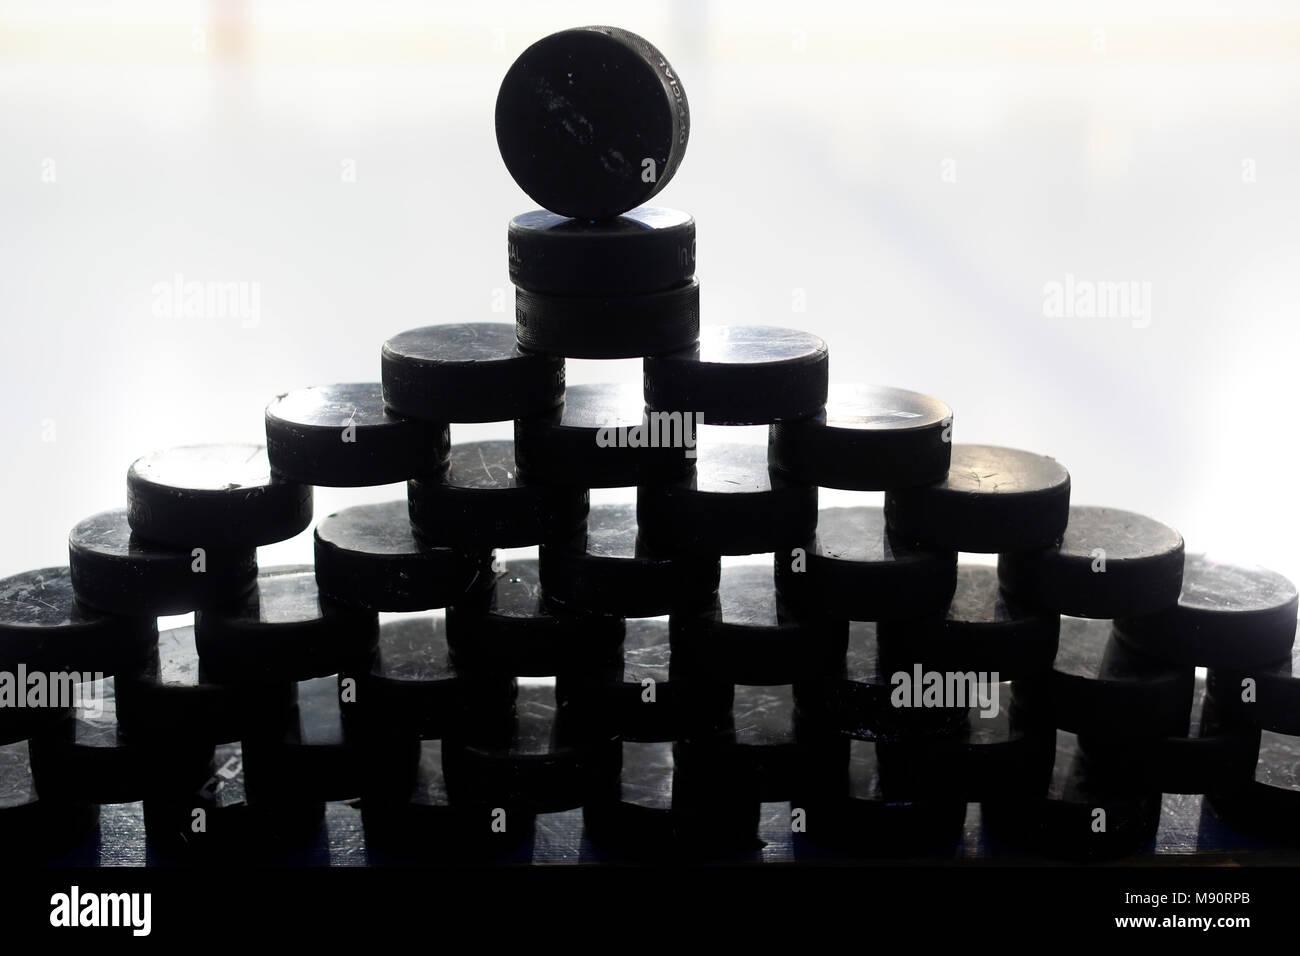 Ice Hockey Pucks. - Stock Image